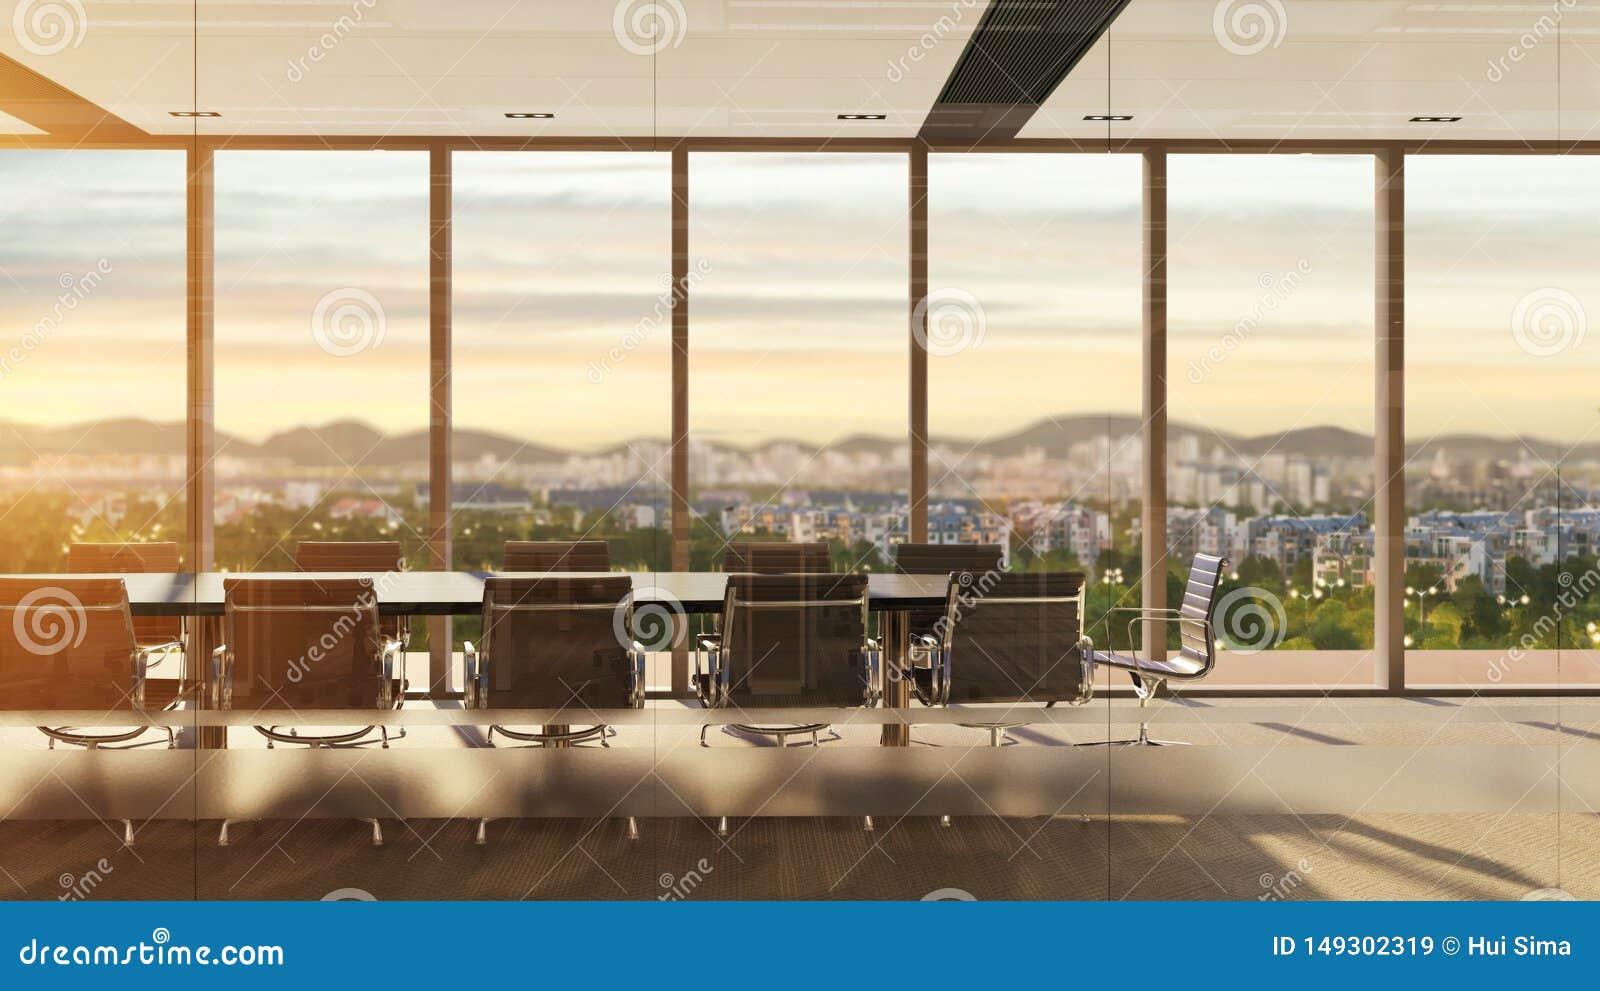 Иллюстрация конференц-зала никто с видом на город на заходе солнца